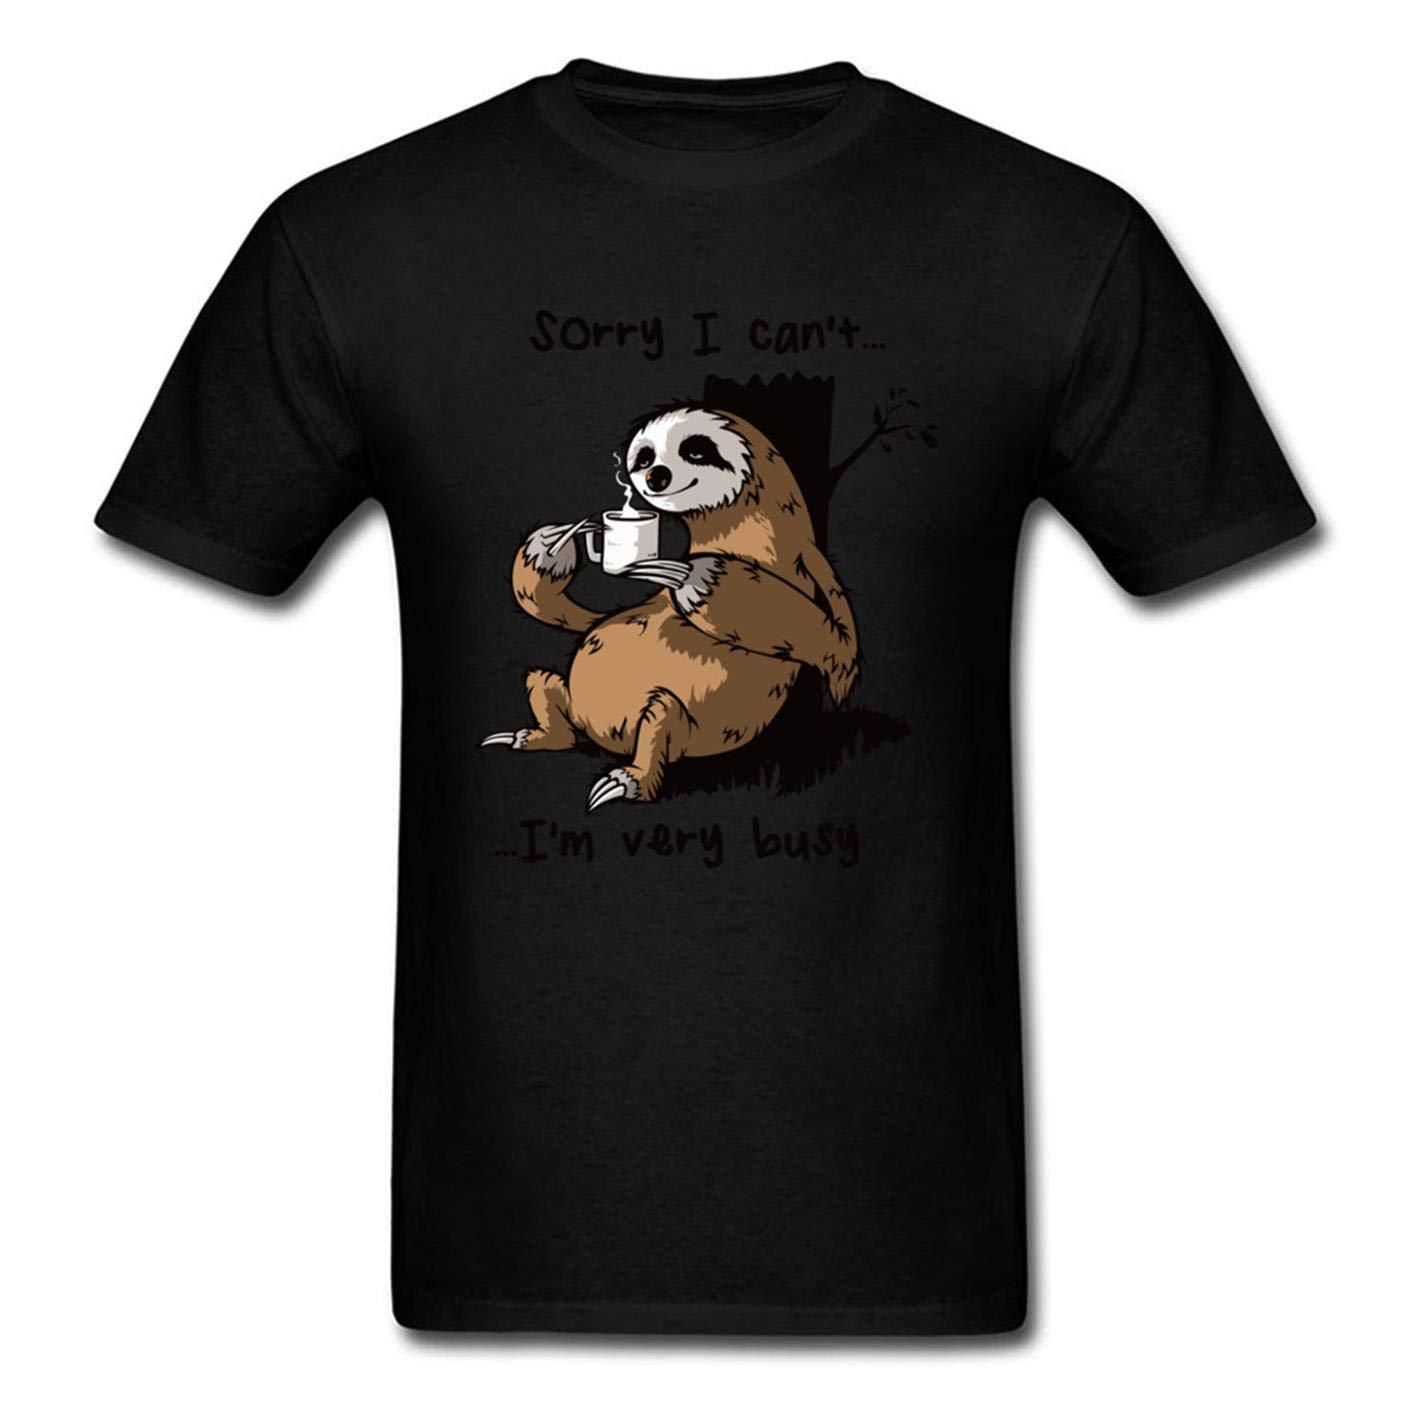 Slaoero Very Busy Sloth S Tshirt Printing Short Sleeve Tee